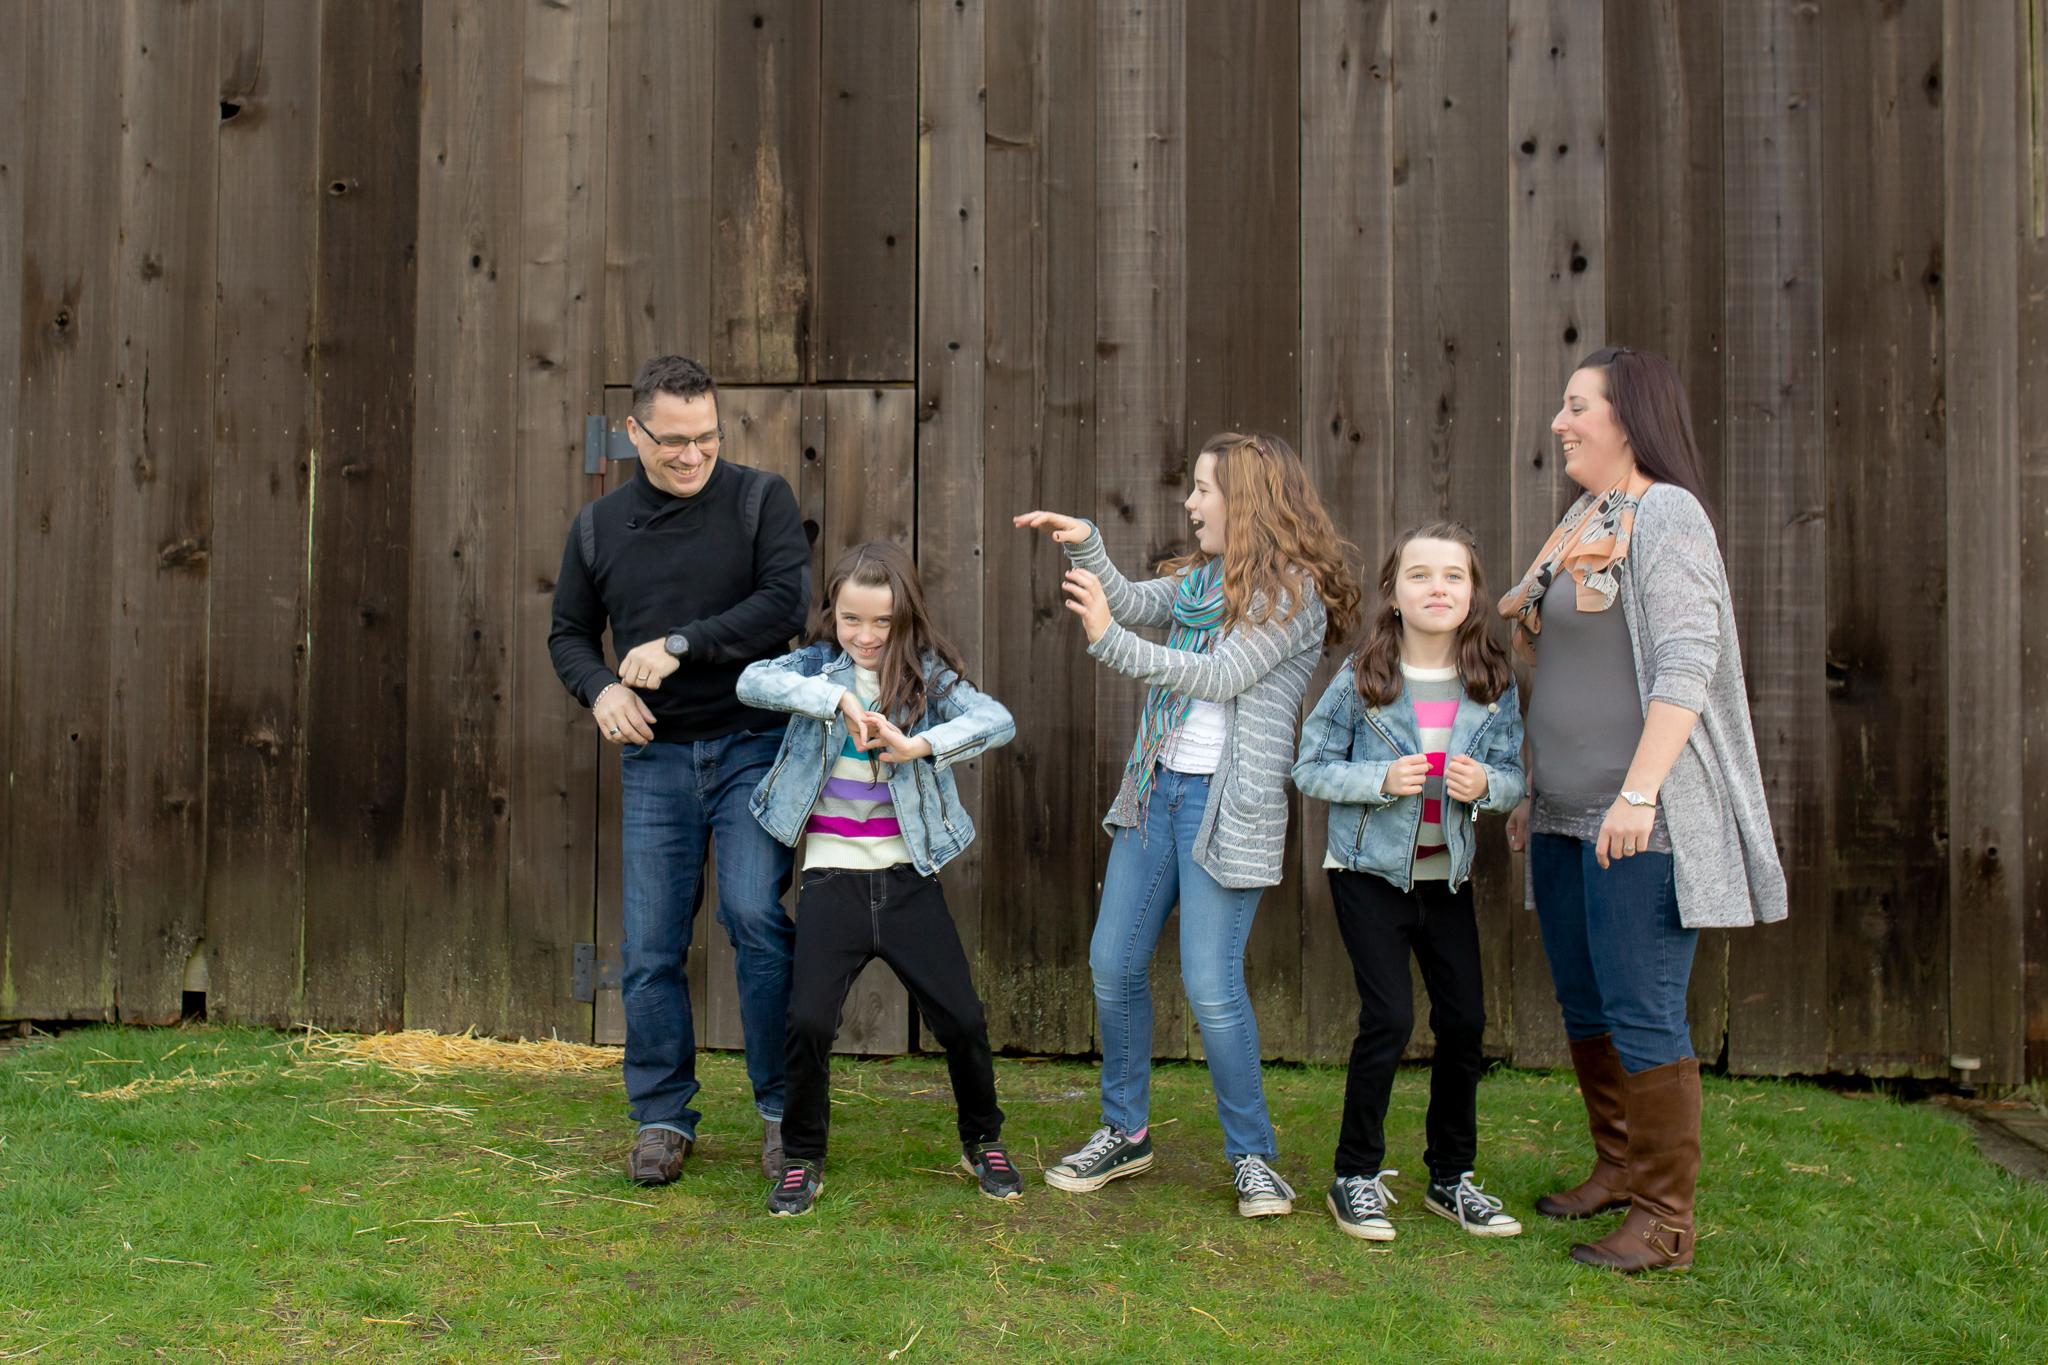 Campbell Valley Park Family Photos